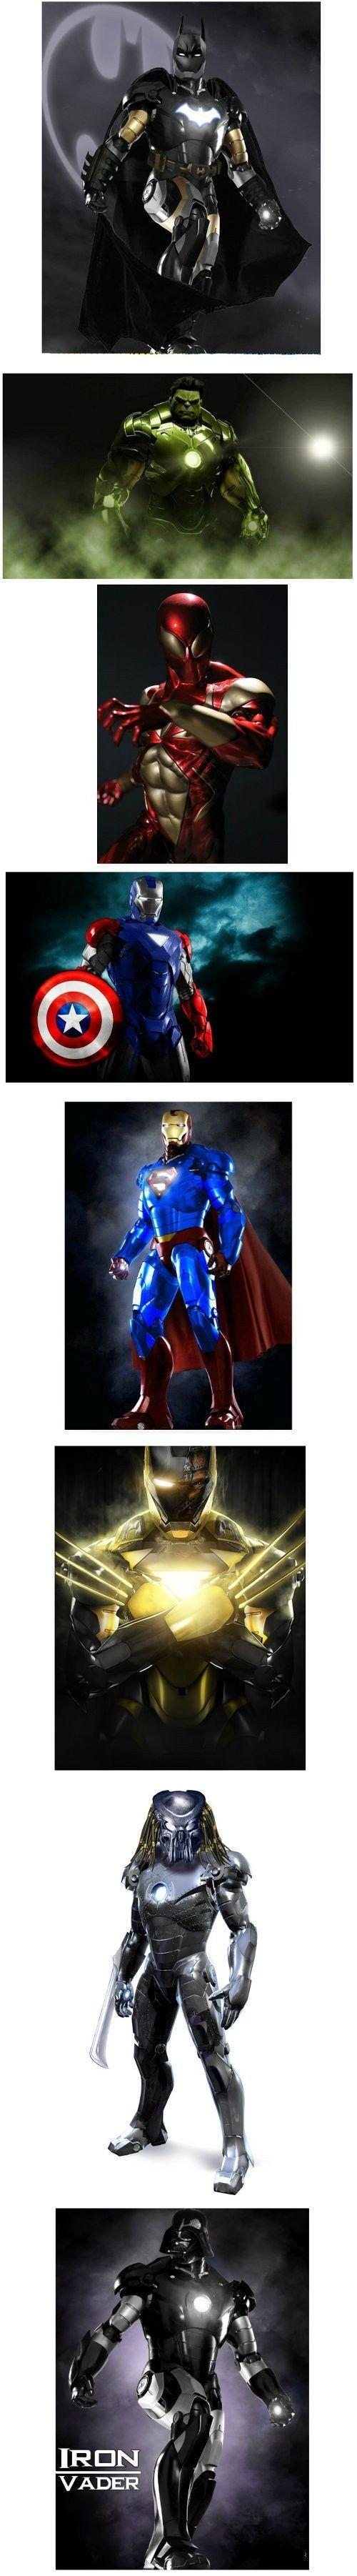 Superheroes in Iron Man suit - Superheroes,Iron Man,Batman,Hulk,Spider-man,Captain America,Superman,The Wolverine,Darth Vader  Hulk looks Beast